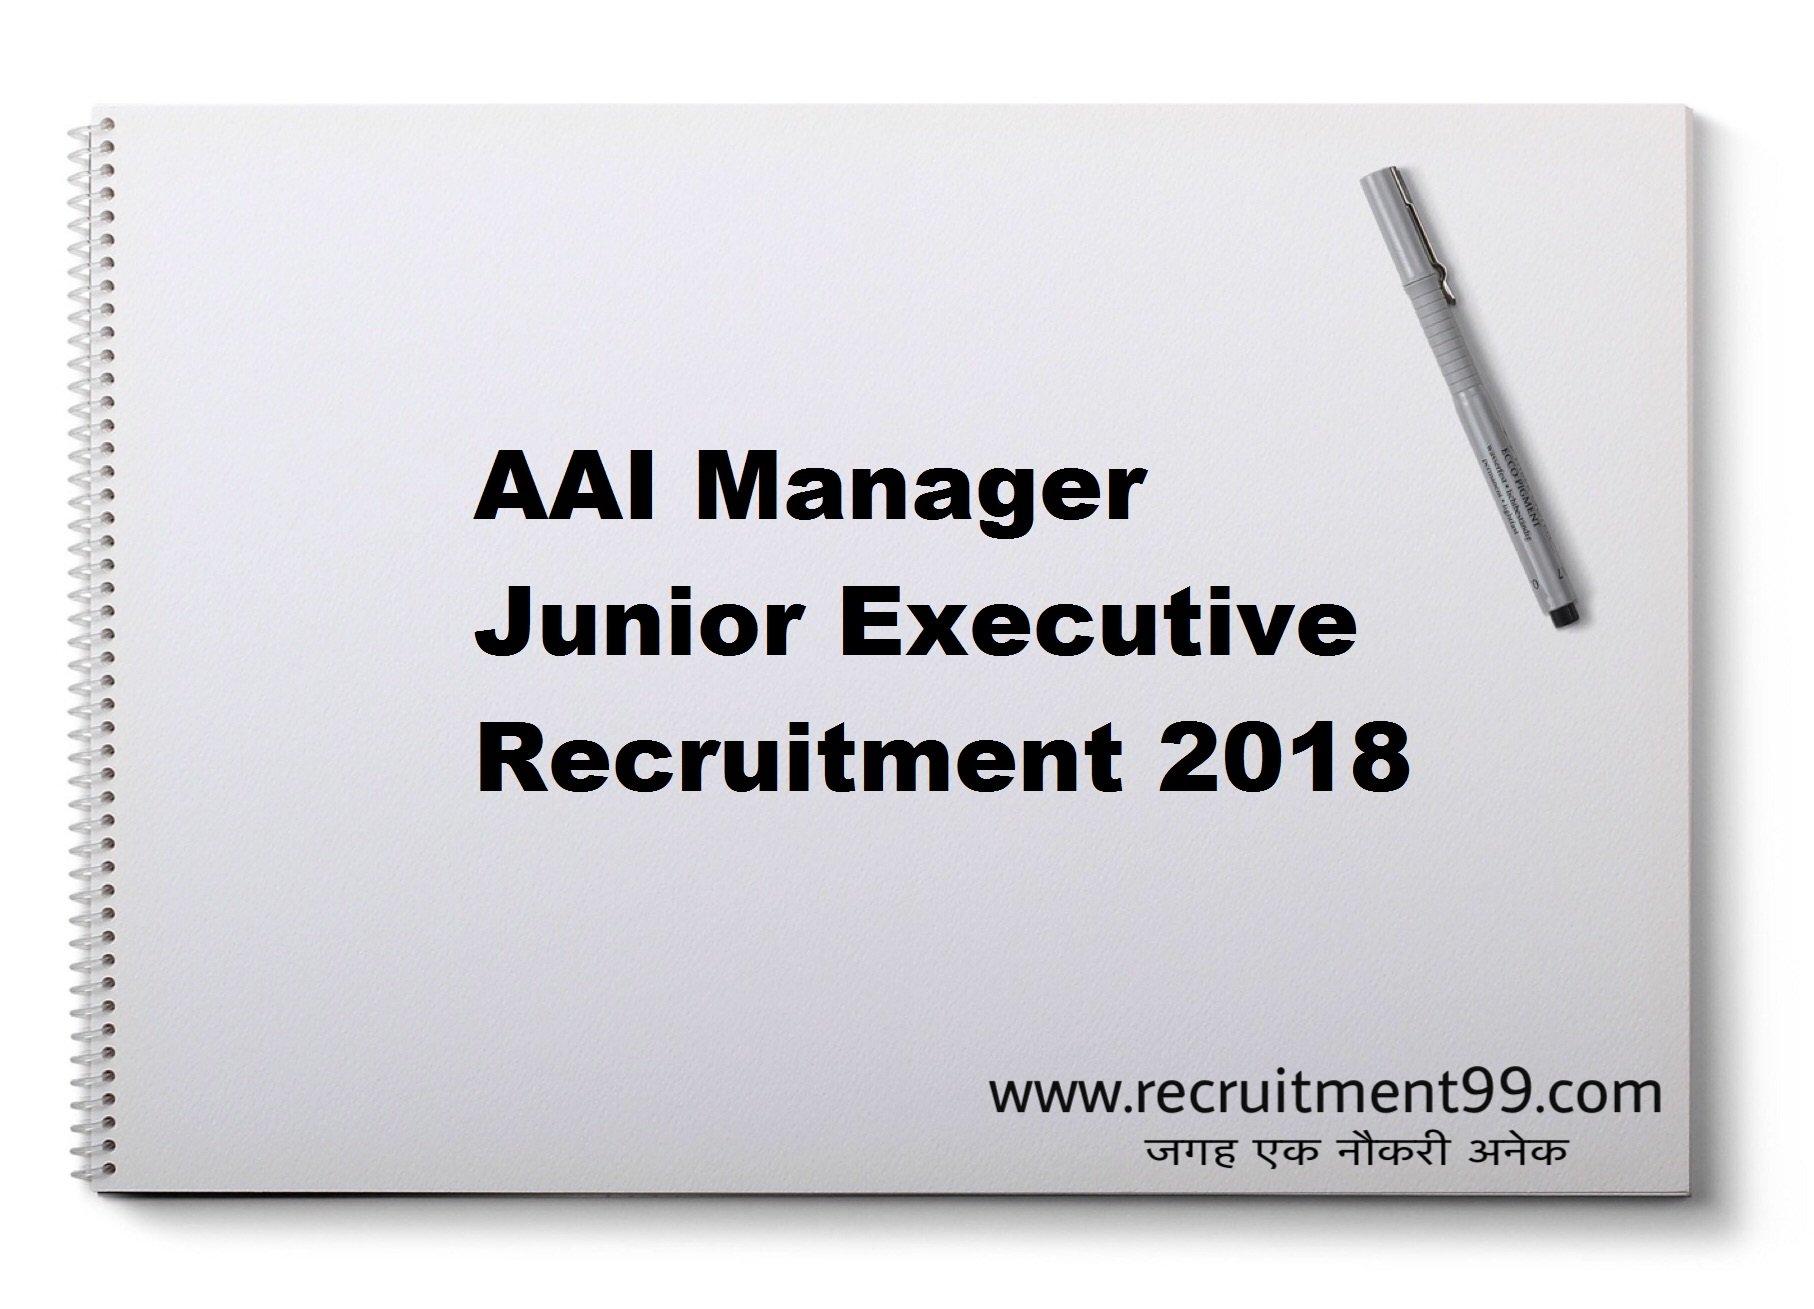 AAI Manager Junior Executive Recruitment Admit Card Result 2018